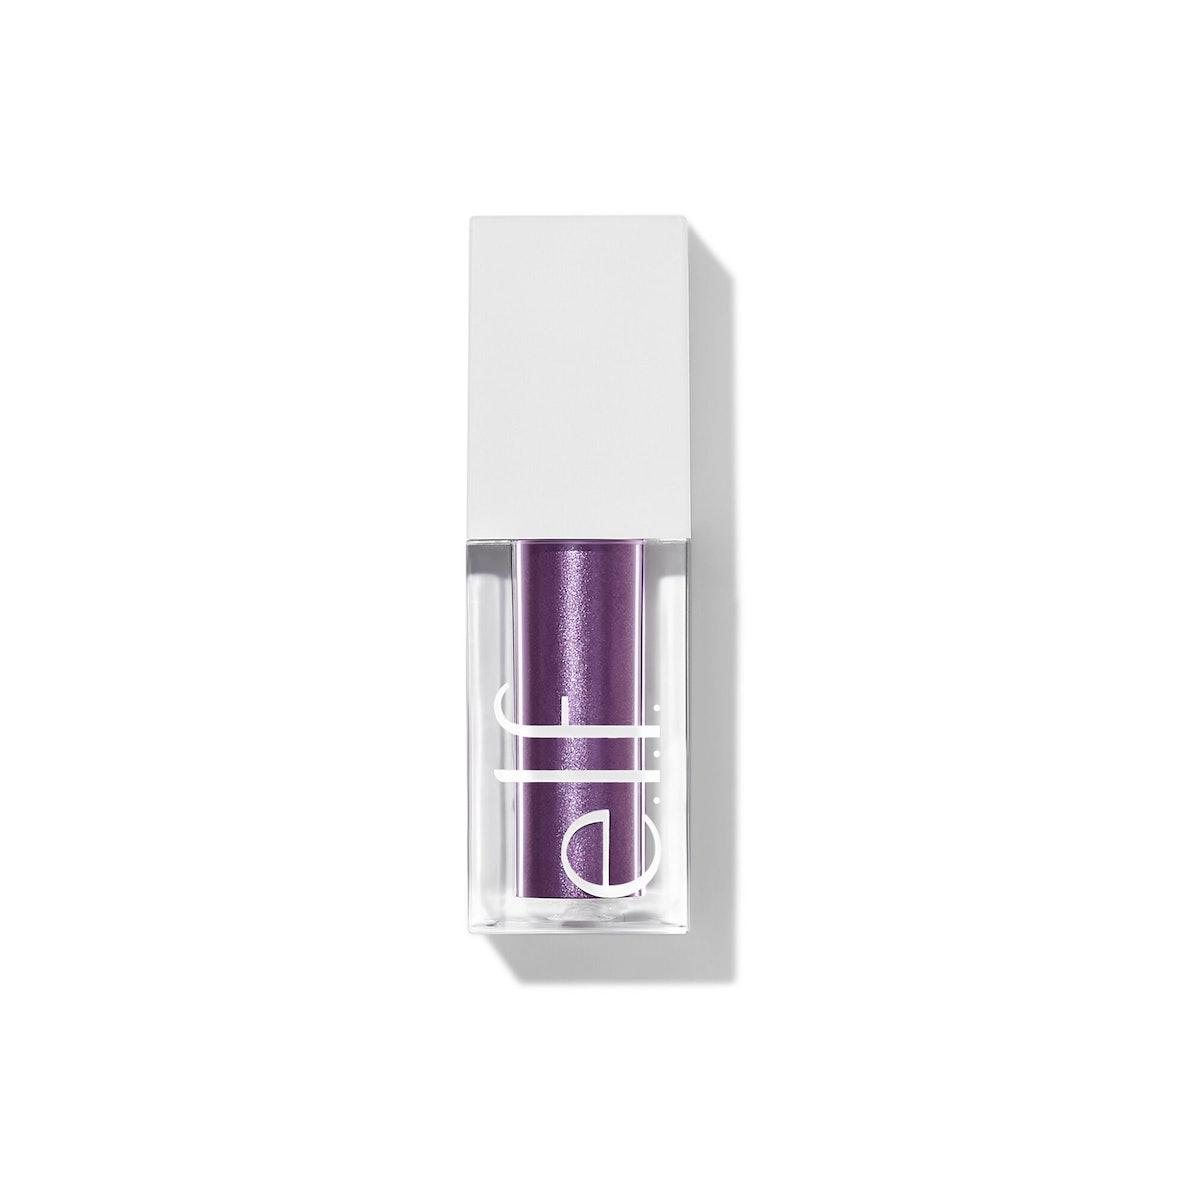 e.l.f. Cosmetics Liquid Metallic Eyeshadow